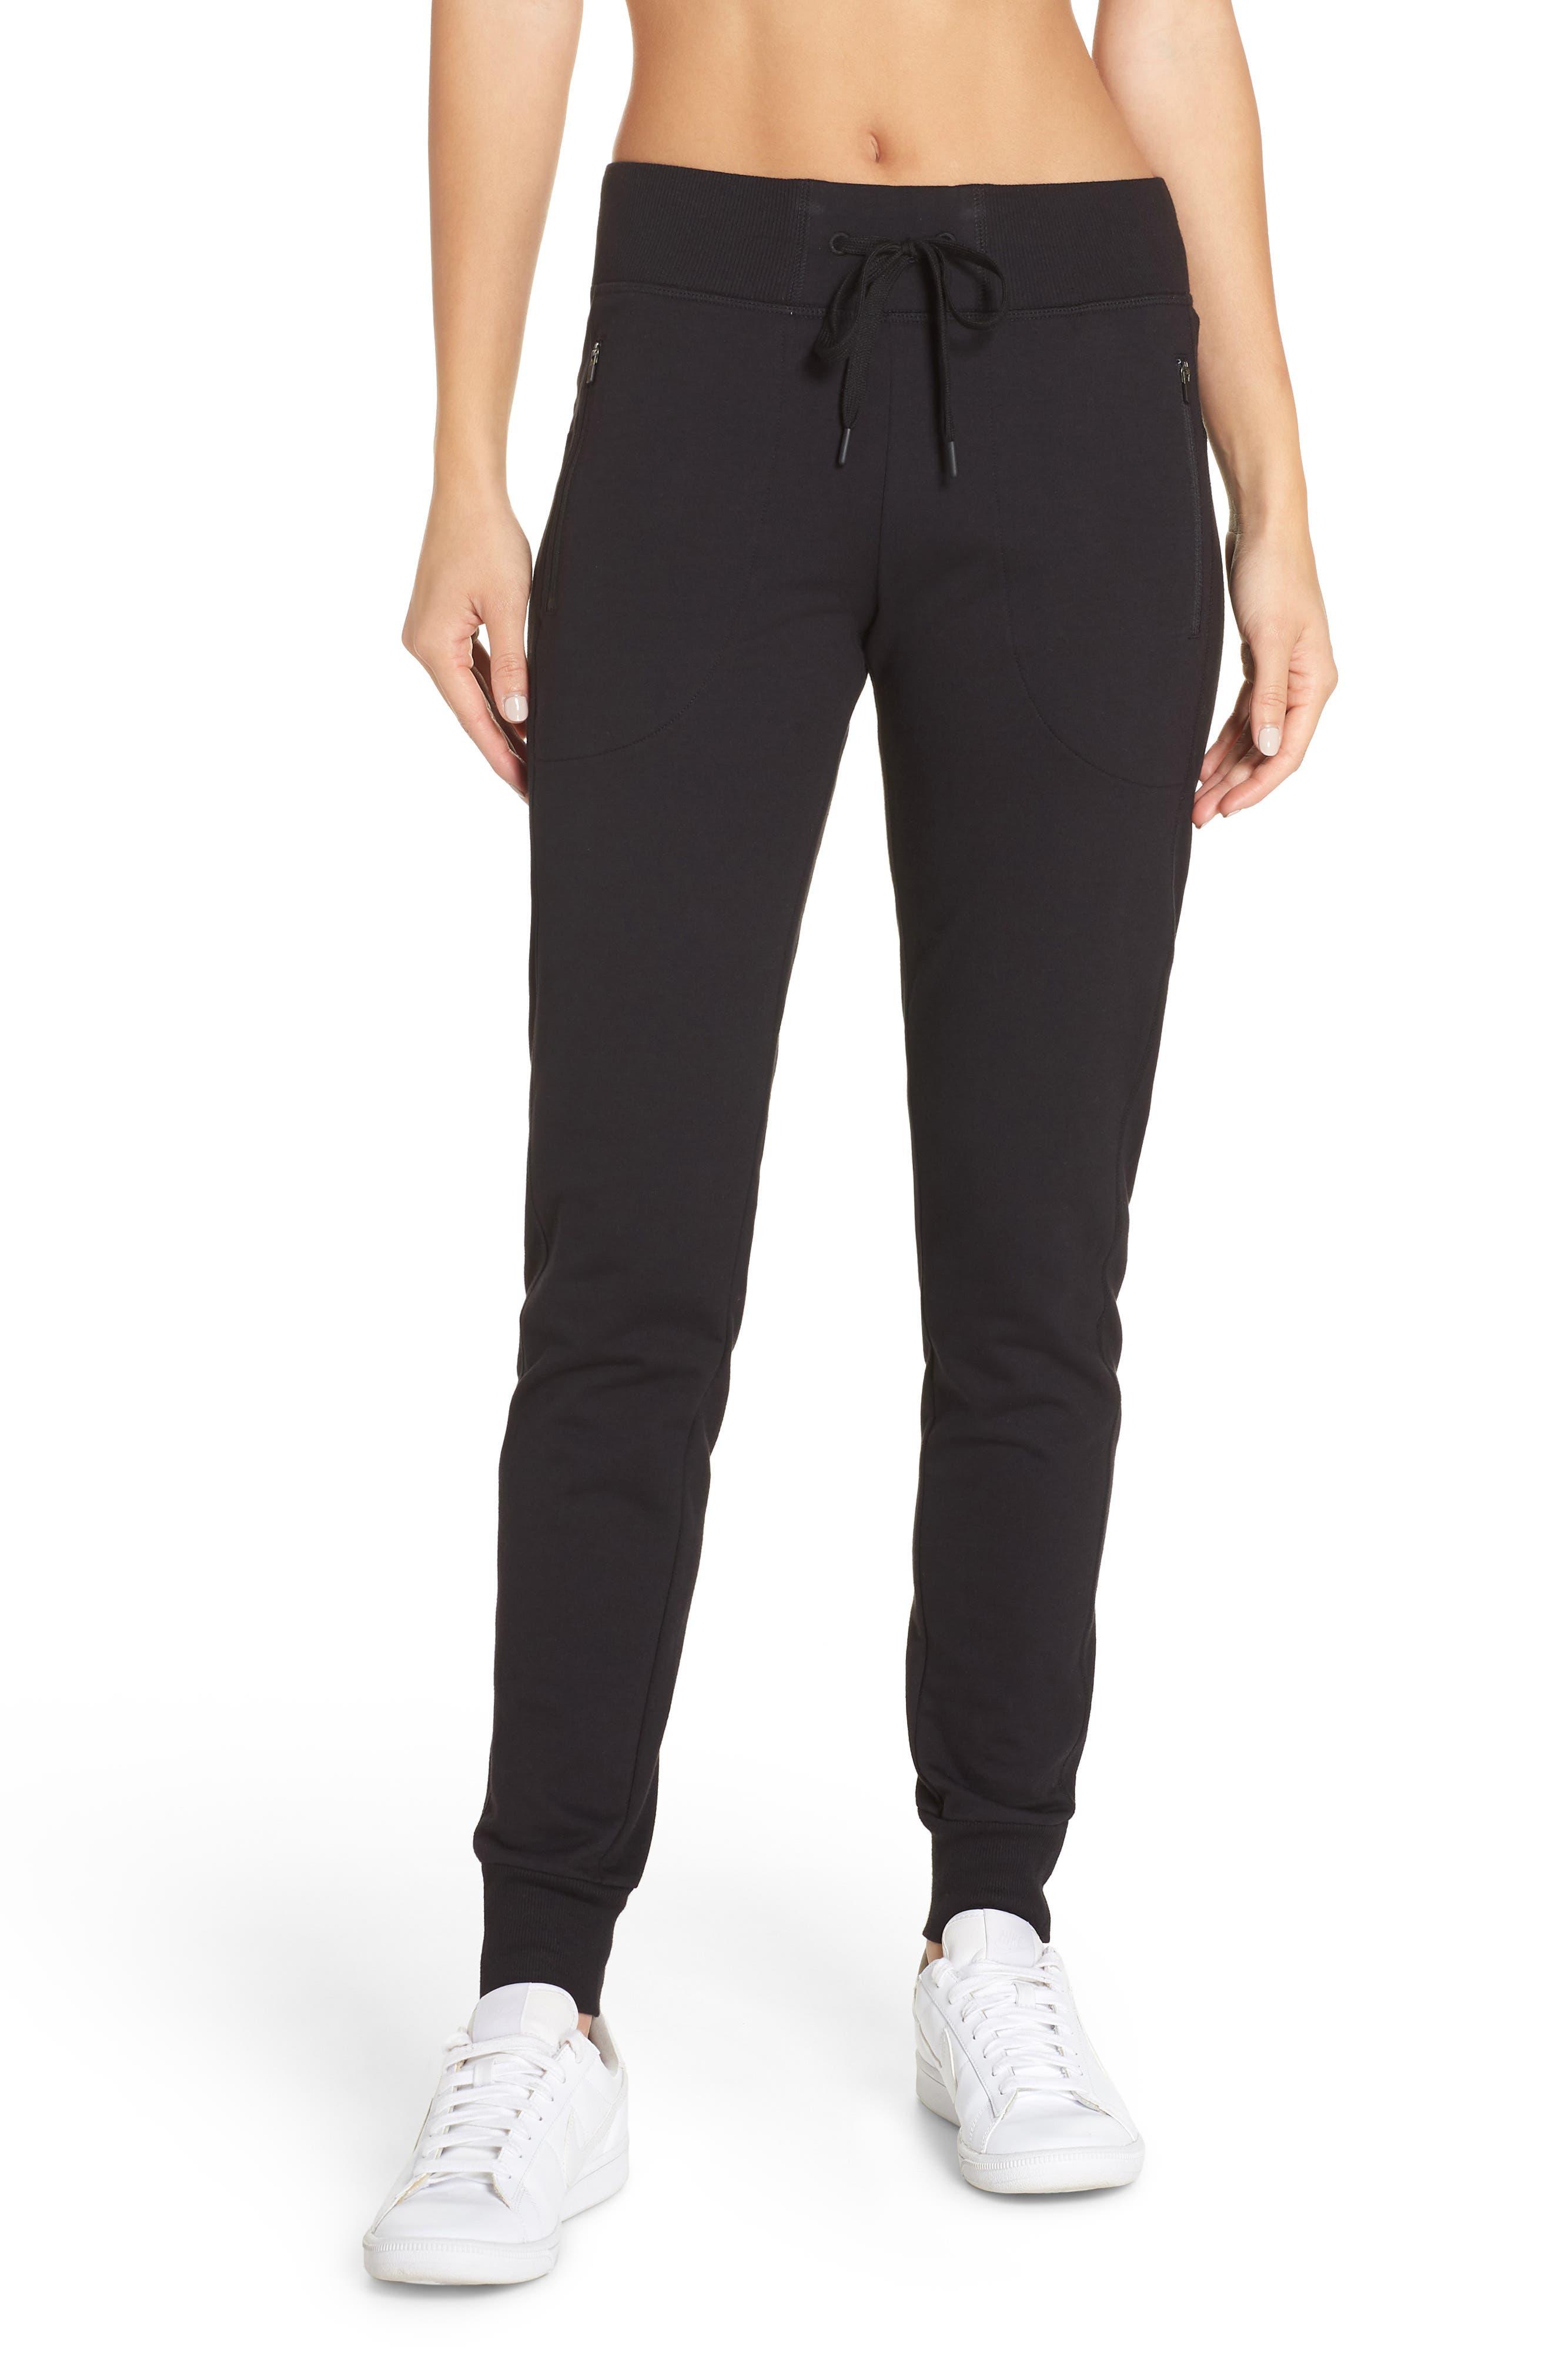 Taryn Sport Knit Pants,                         Main,                         color, Black